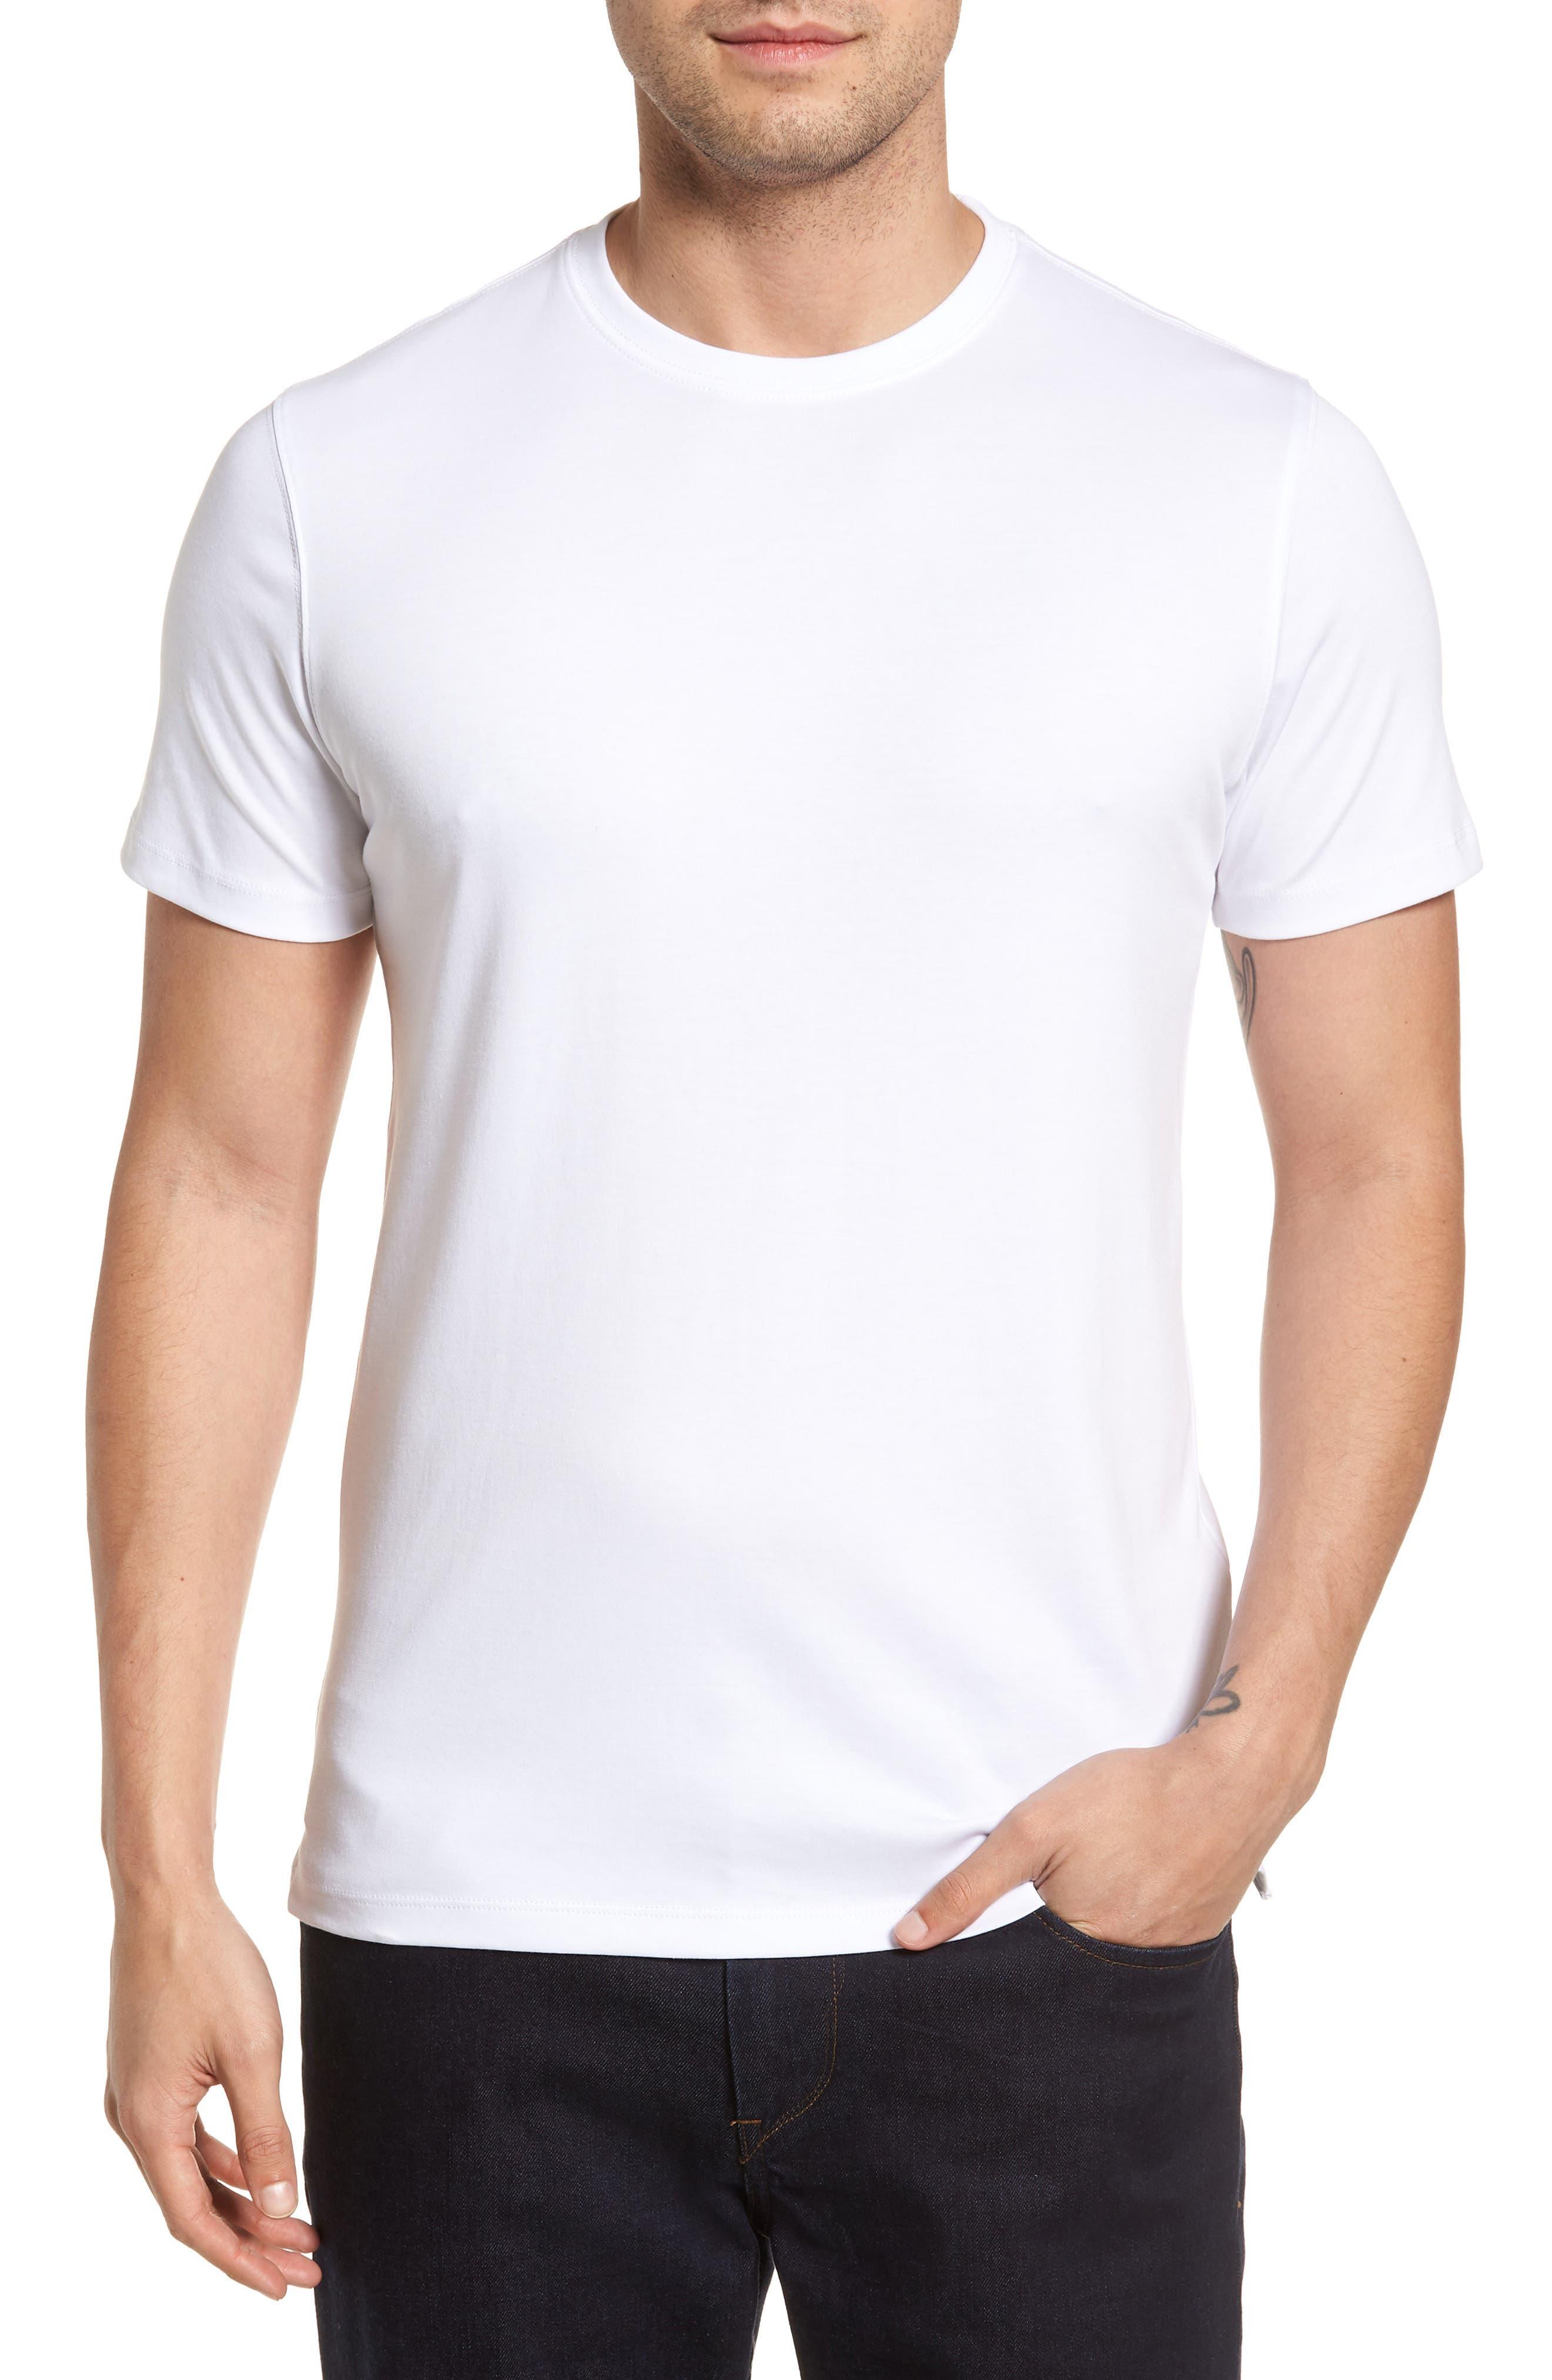 Free Shipping Big Discount Cheap Footlocker Mens Retro Sparkles Regular Fit Classic Short Sleeve T-Shirt Walls Best Place T4KBo9